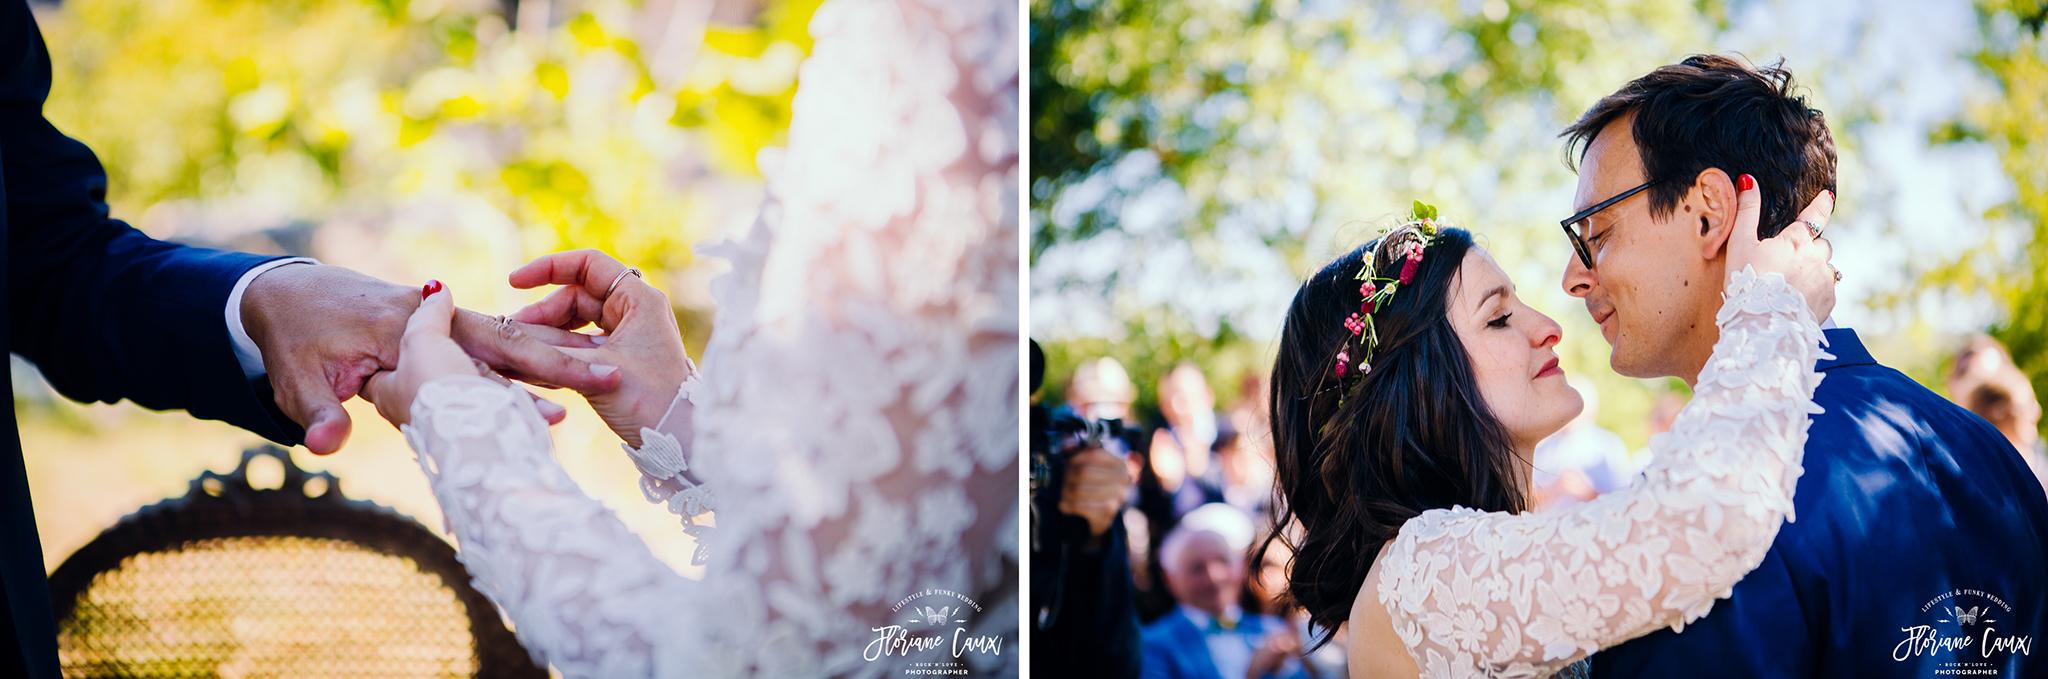 mariage-festival-cahors-ceremonie-laique-velo-licorne-6